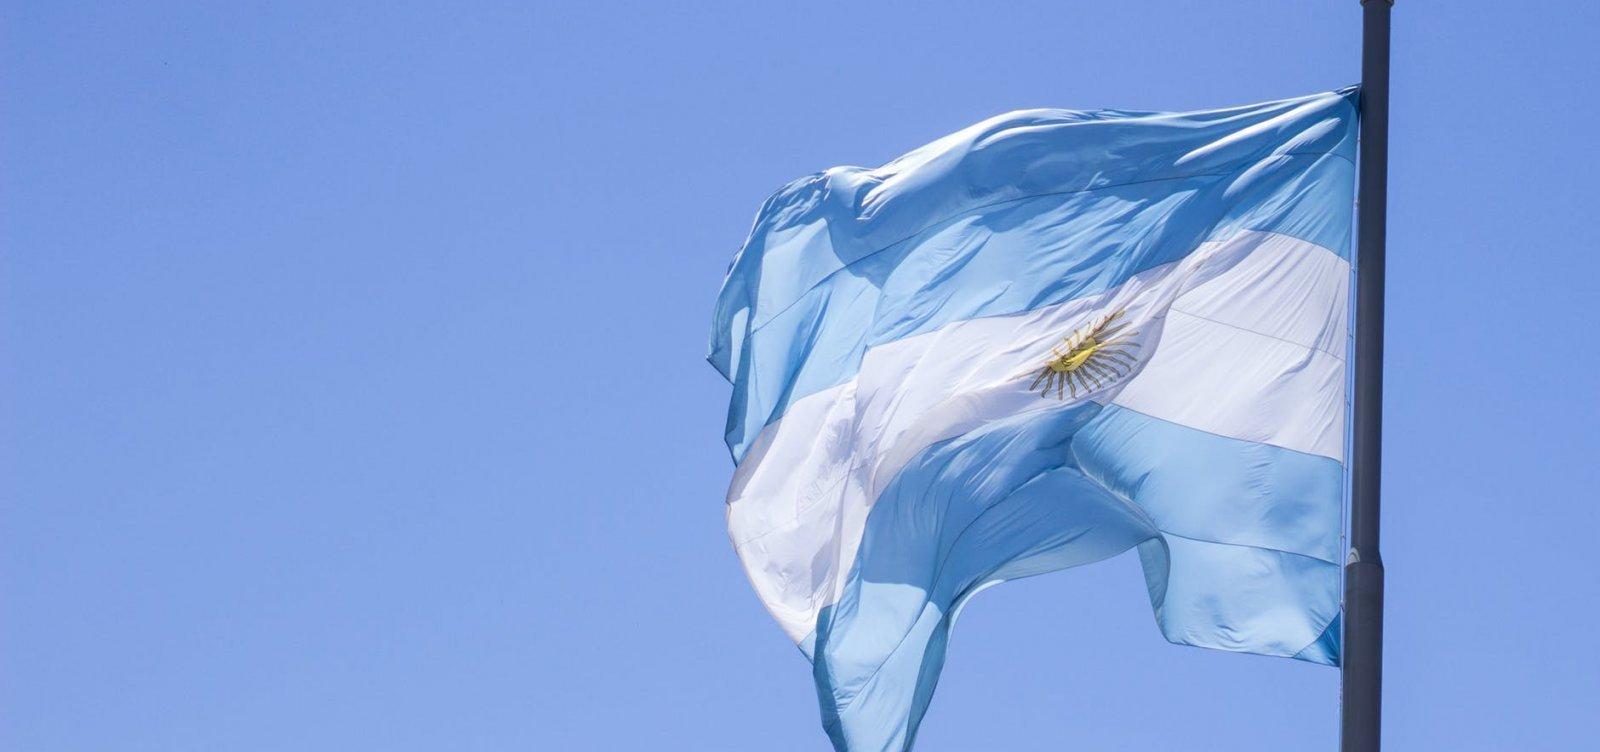 Argentina impõe novas medidas restritivas para combater a pandemia de Covid-19